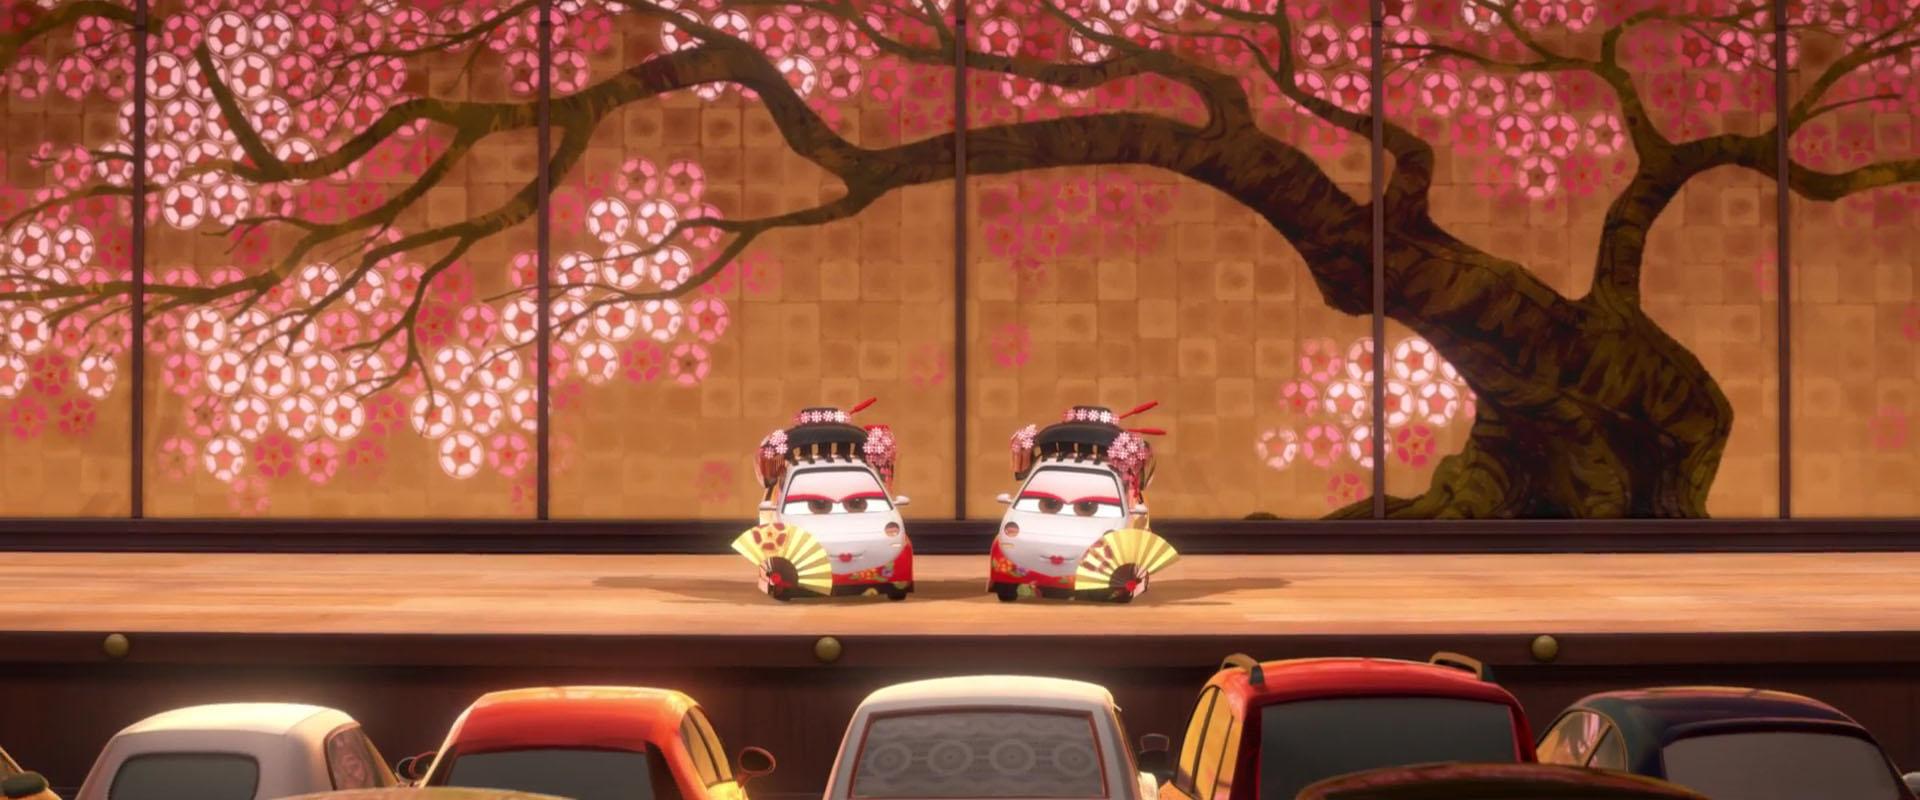 okuni-personnage-cars-2-01